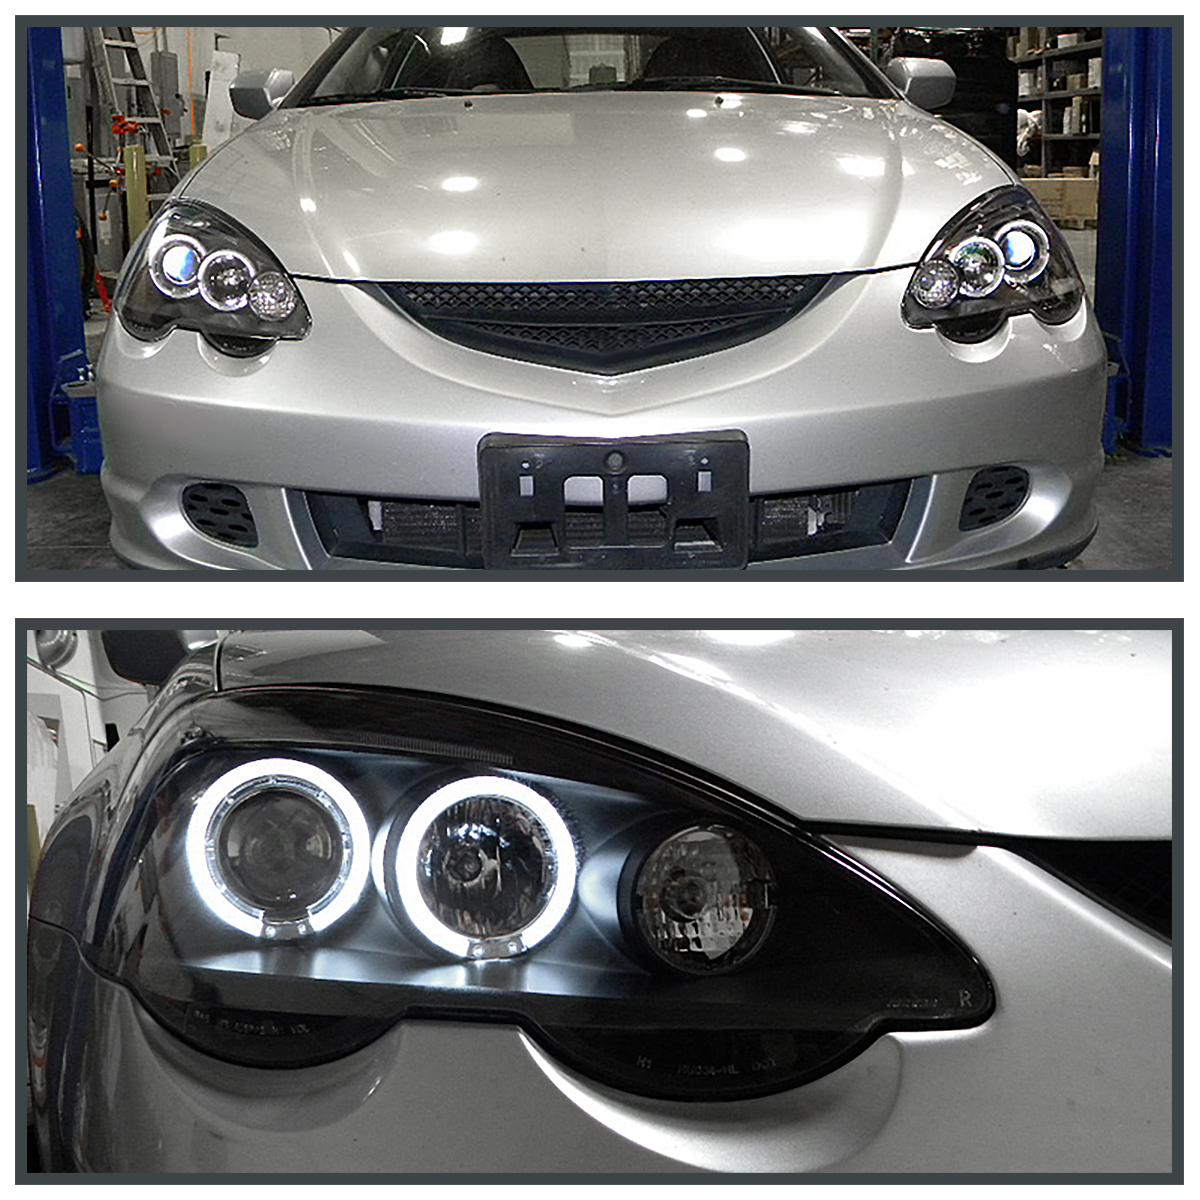 Acura RSX LED Eyelid HALO Projector Headlights Black Pair - 2002 acura rsx type s headlights